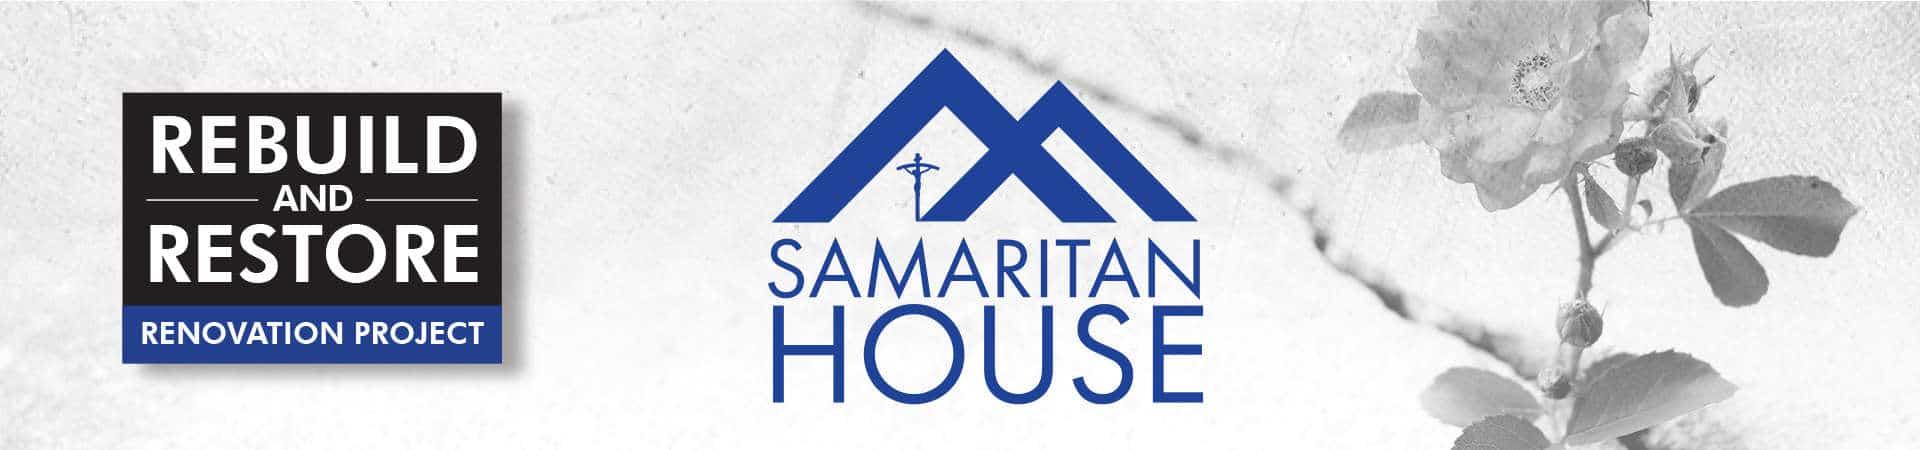 Help Rebuild and Renovate Samaritan House